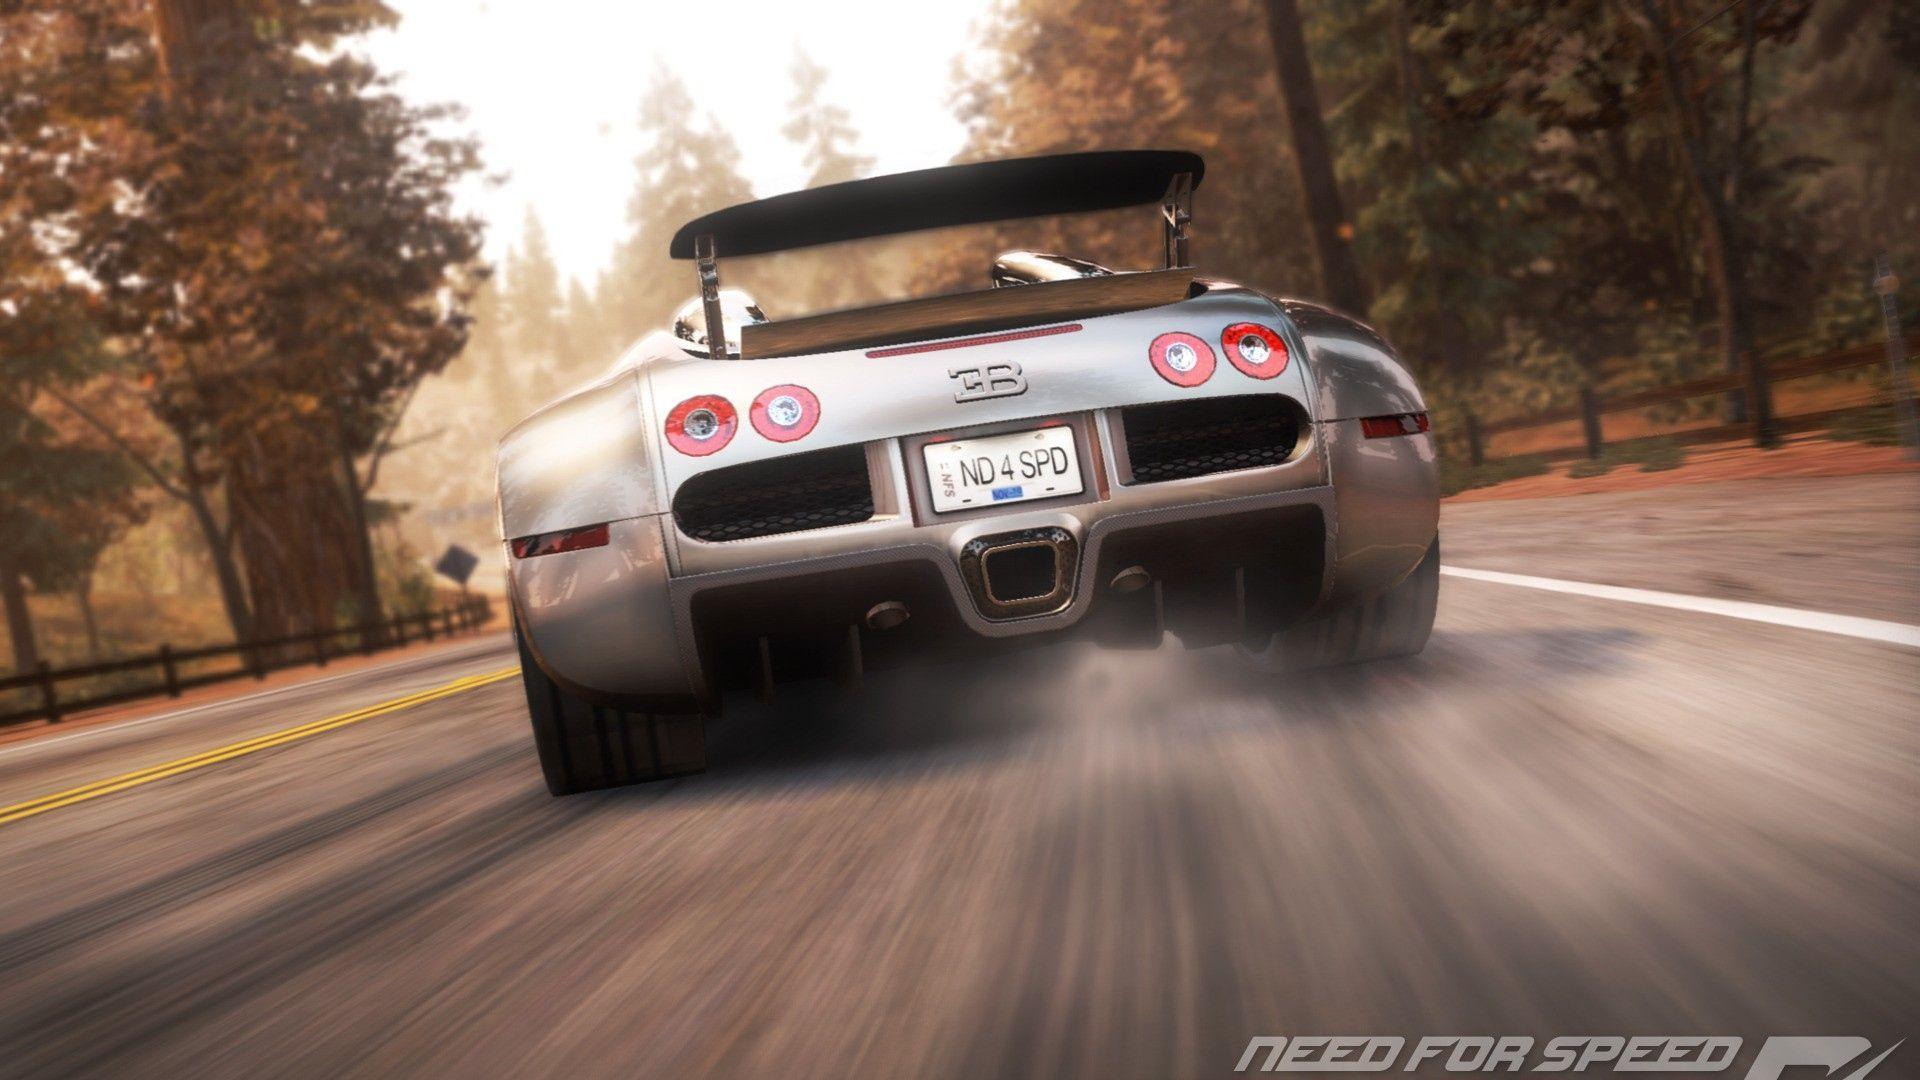 dc56bd5c20e45e4b9c3472573e39d1e1 Astounding Bugatti Veyron Need for Speed World Cars Trend